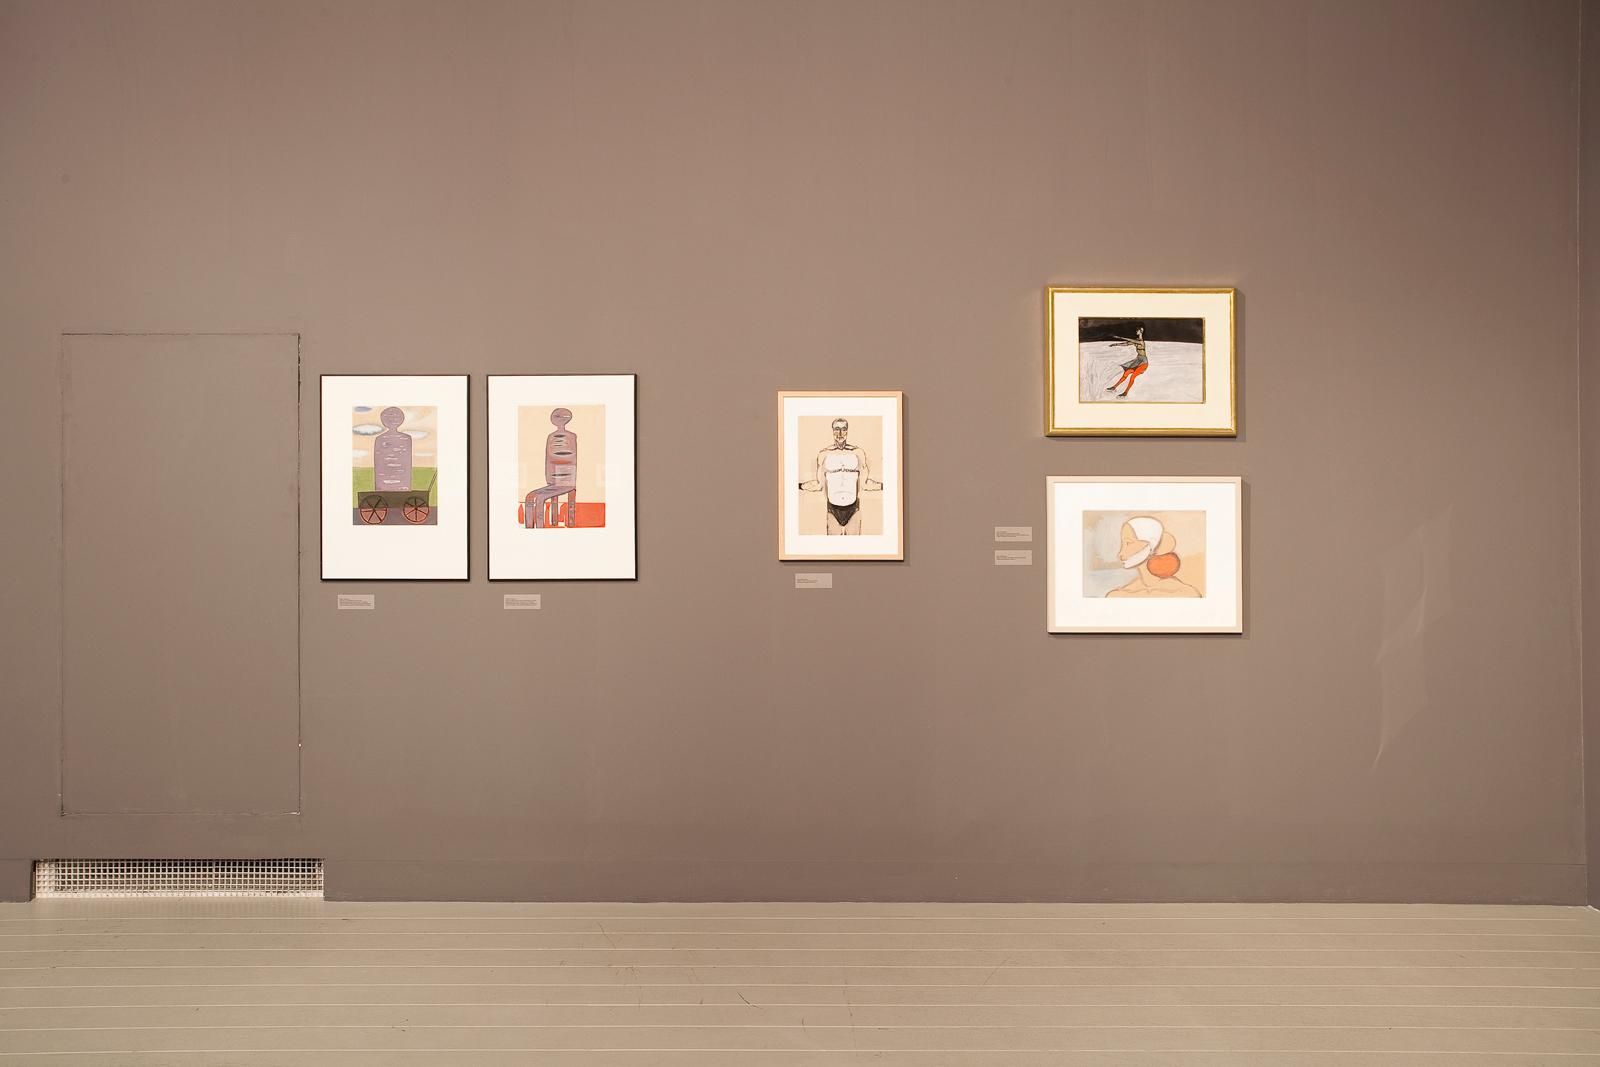 DE. FI. CIEN. CY  –  Andrzej Wróblewski, René Daniëls, Luc Tuymans - wystawa wgalerii Art Stations, fot.Bartek Buśko